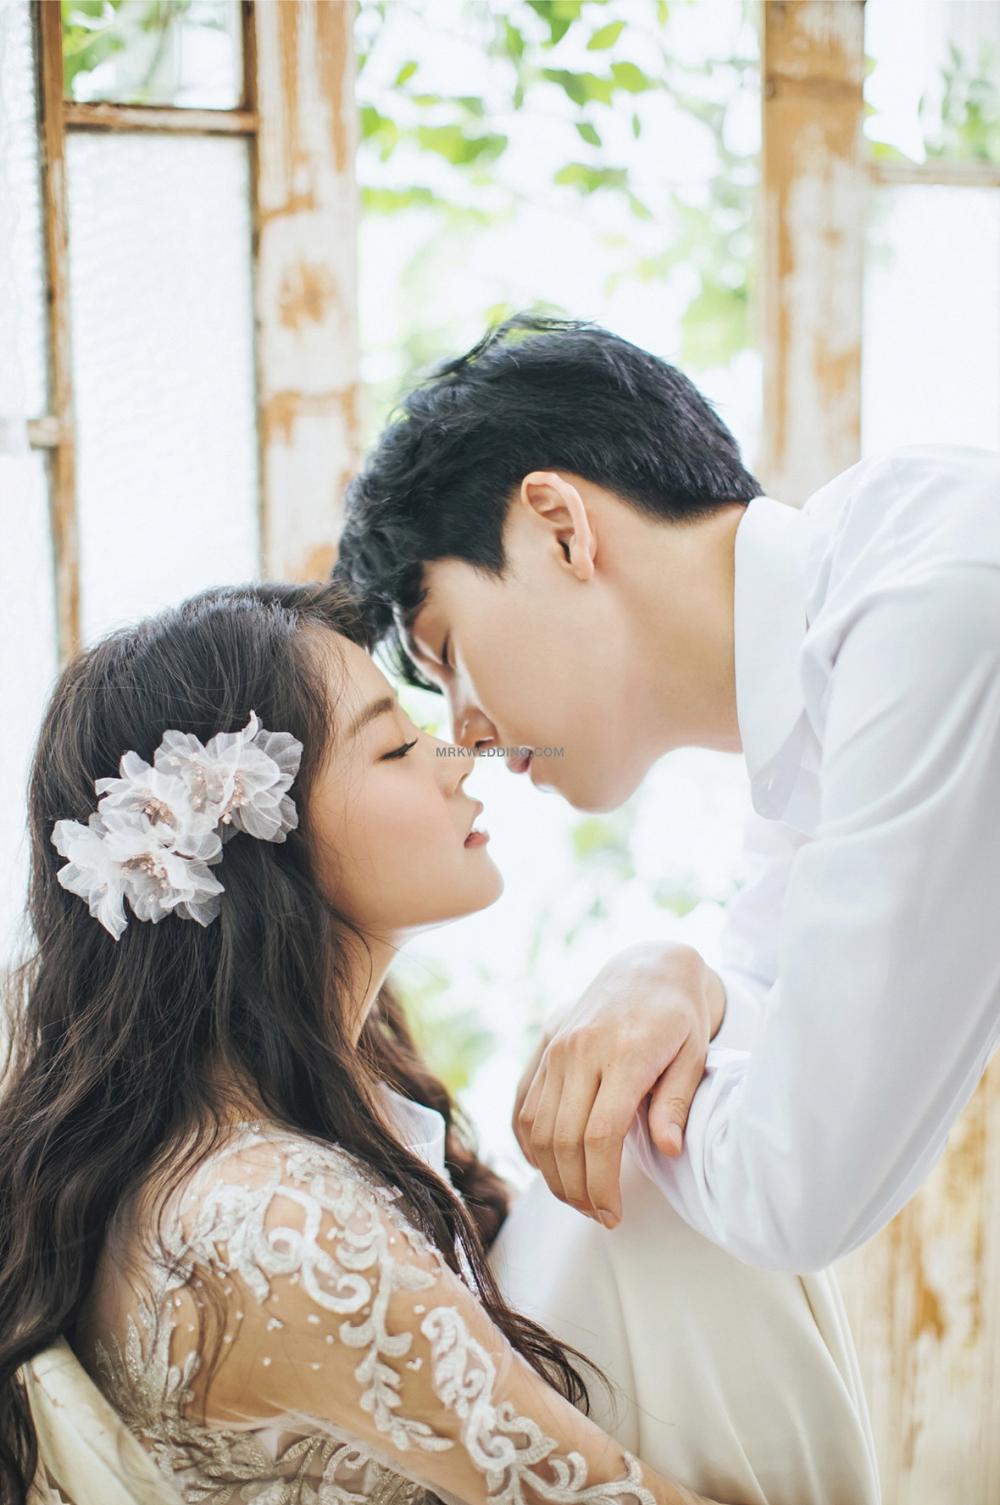 May Studio 2019 New Sample Wedding In 2020 Pre Wedding Photoshoot Wedding Photoshoot Fun Wedding Photography